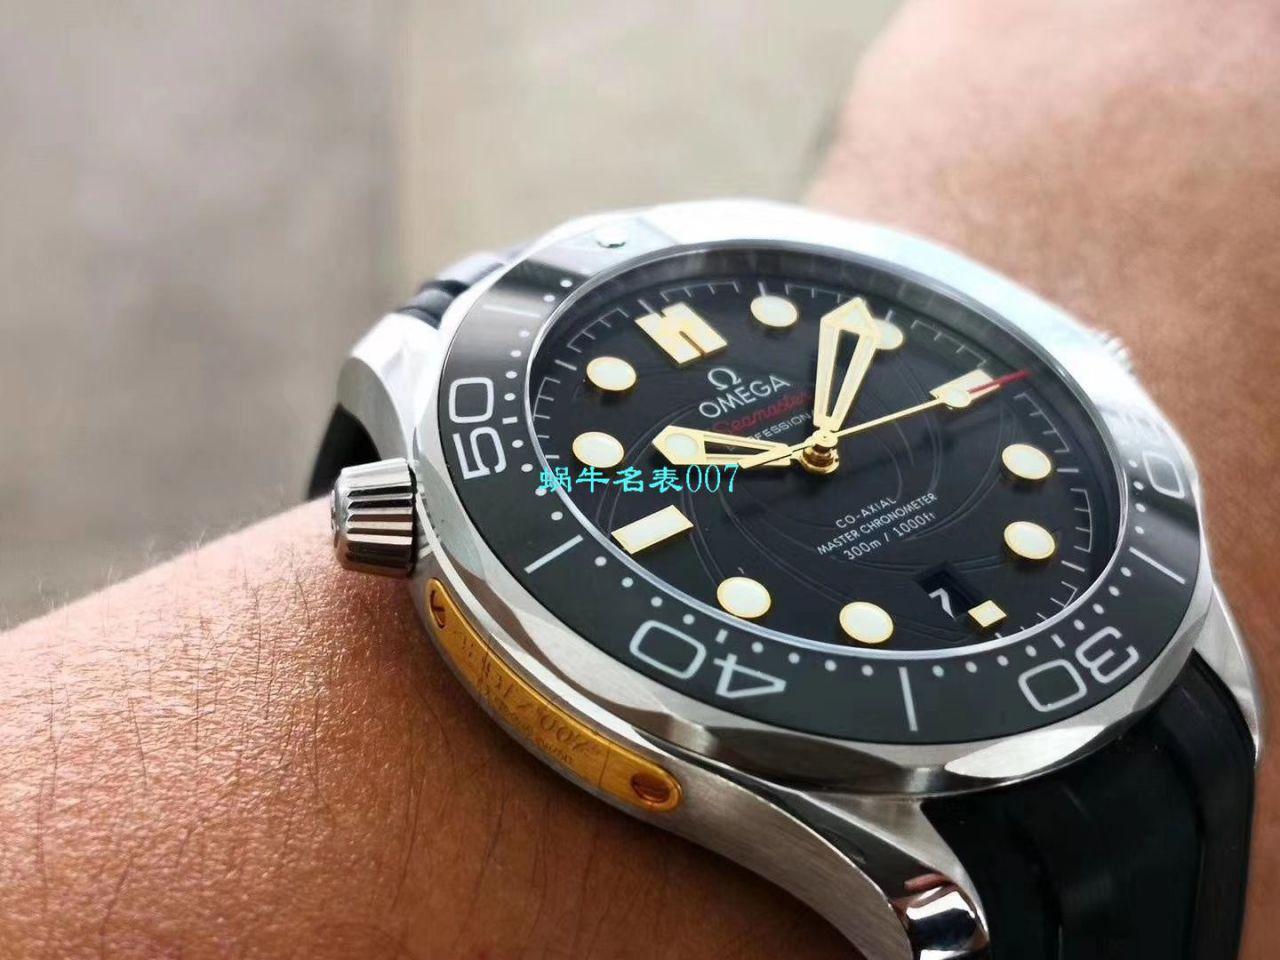 【VS厂007复刻手表】Omega欧米茄全新海马系列300米潜水表詹姆斯·邦德限量版210.22.42.20.01.004